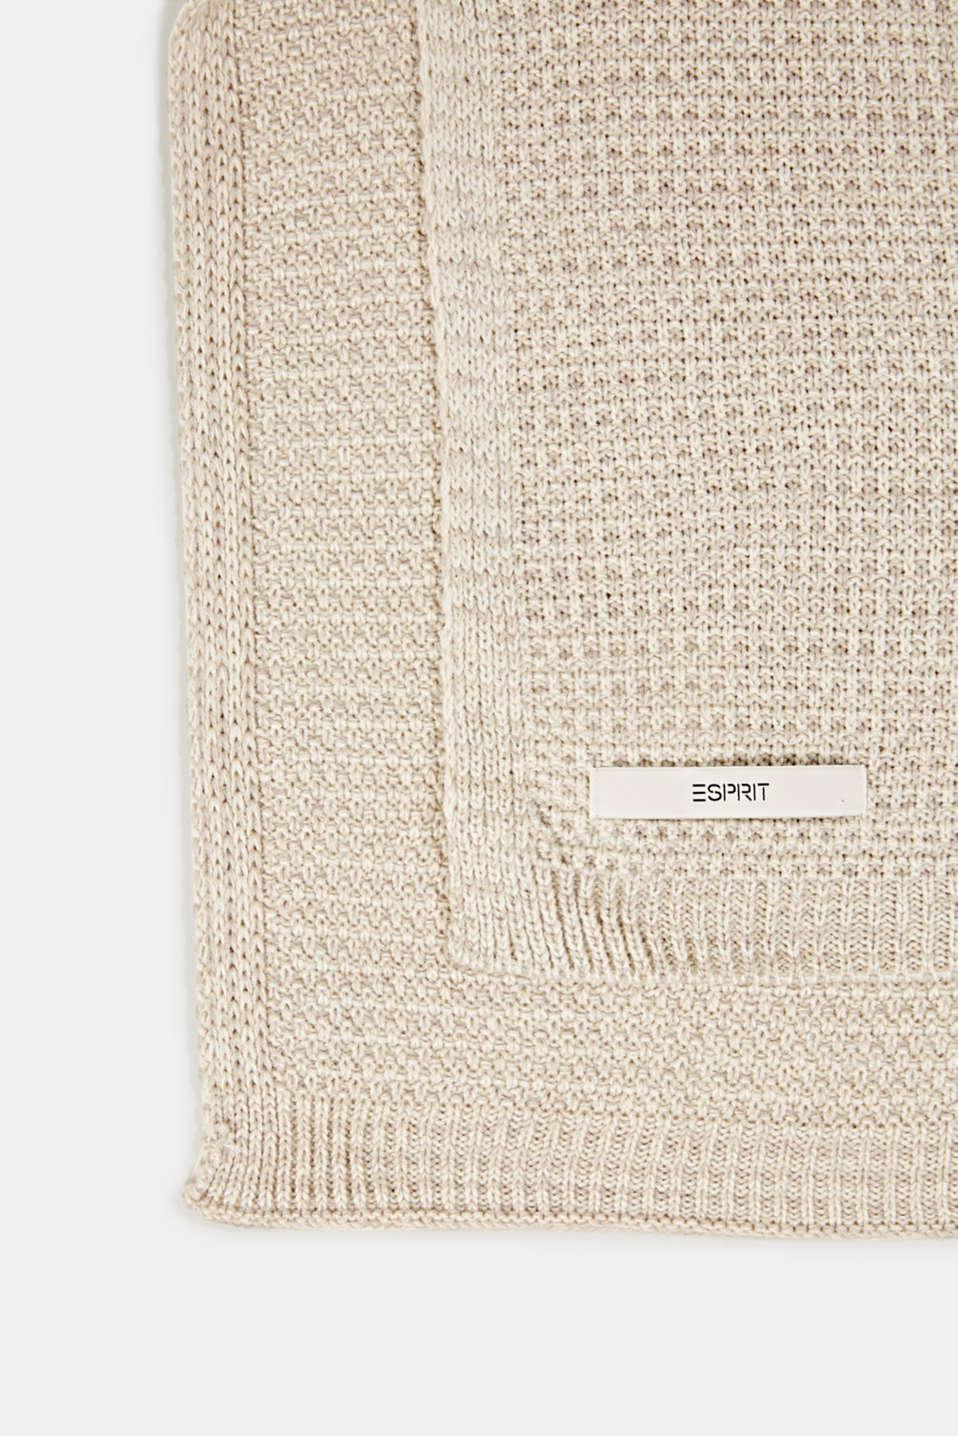 Knit plaid, LCNATURE, detail image number 2